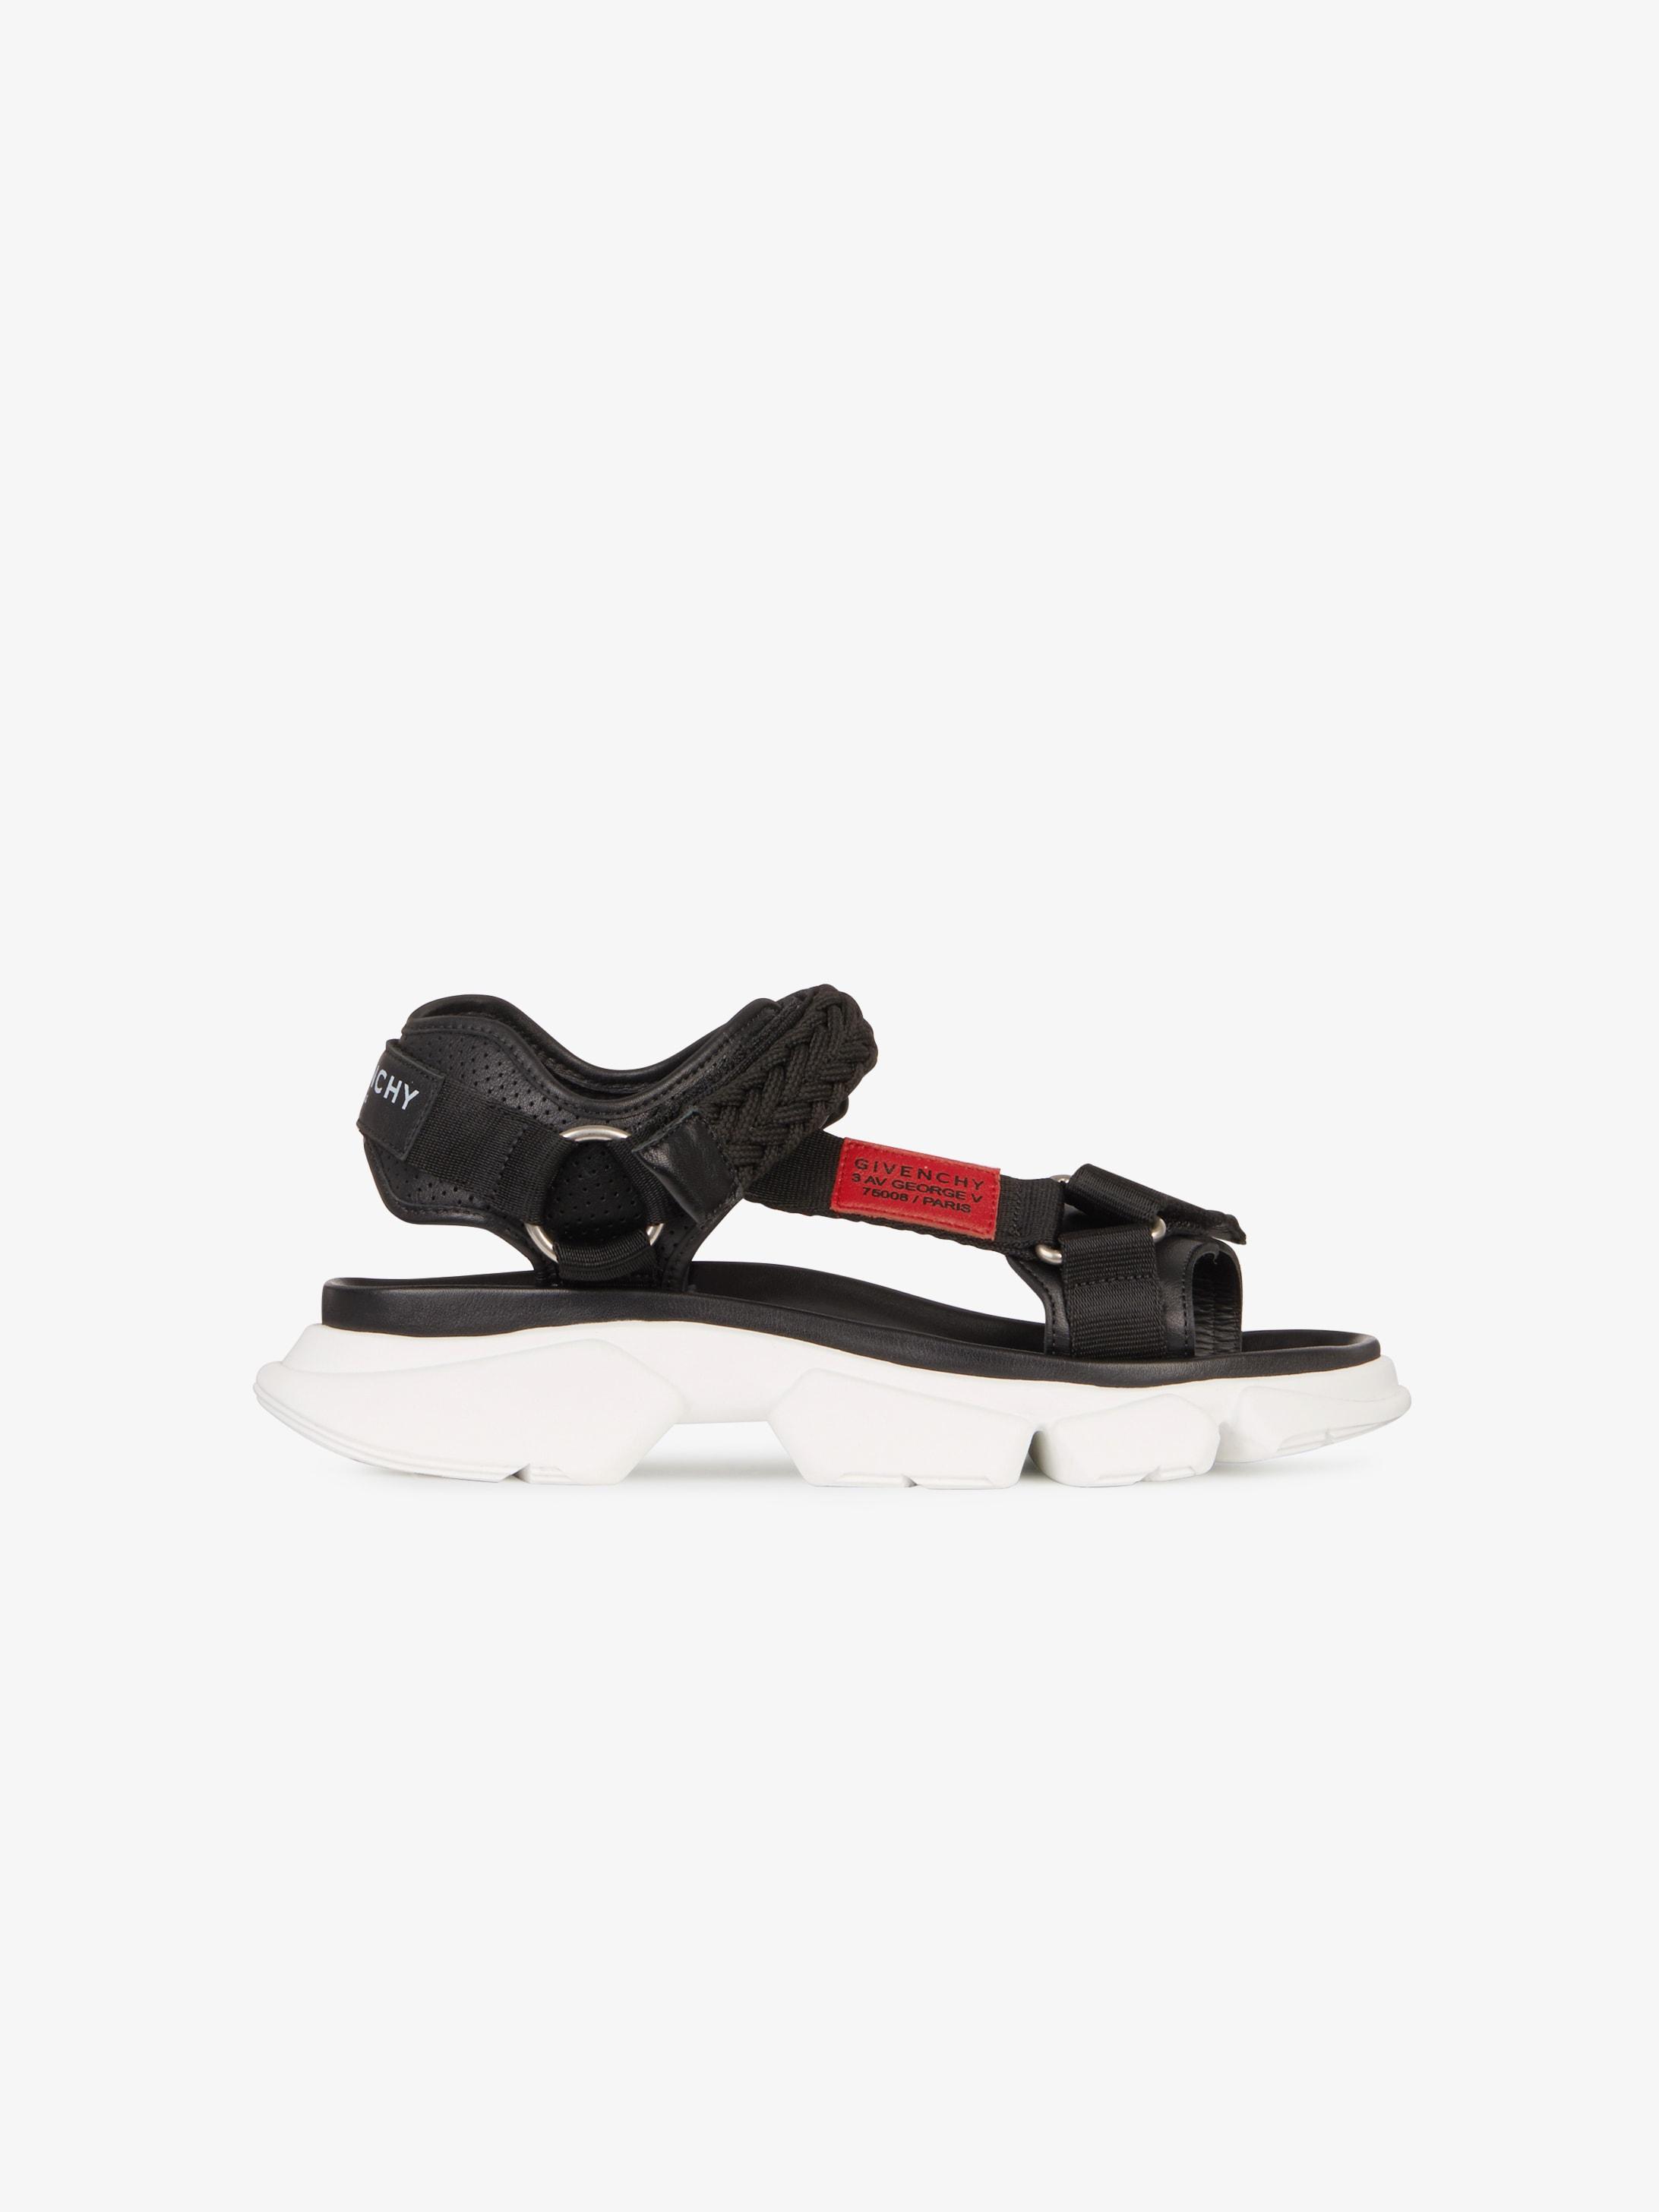 JAW皮革和尼龙凉鞋